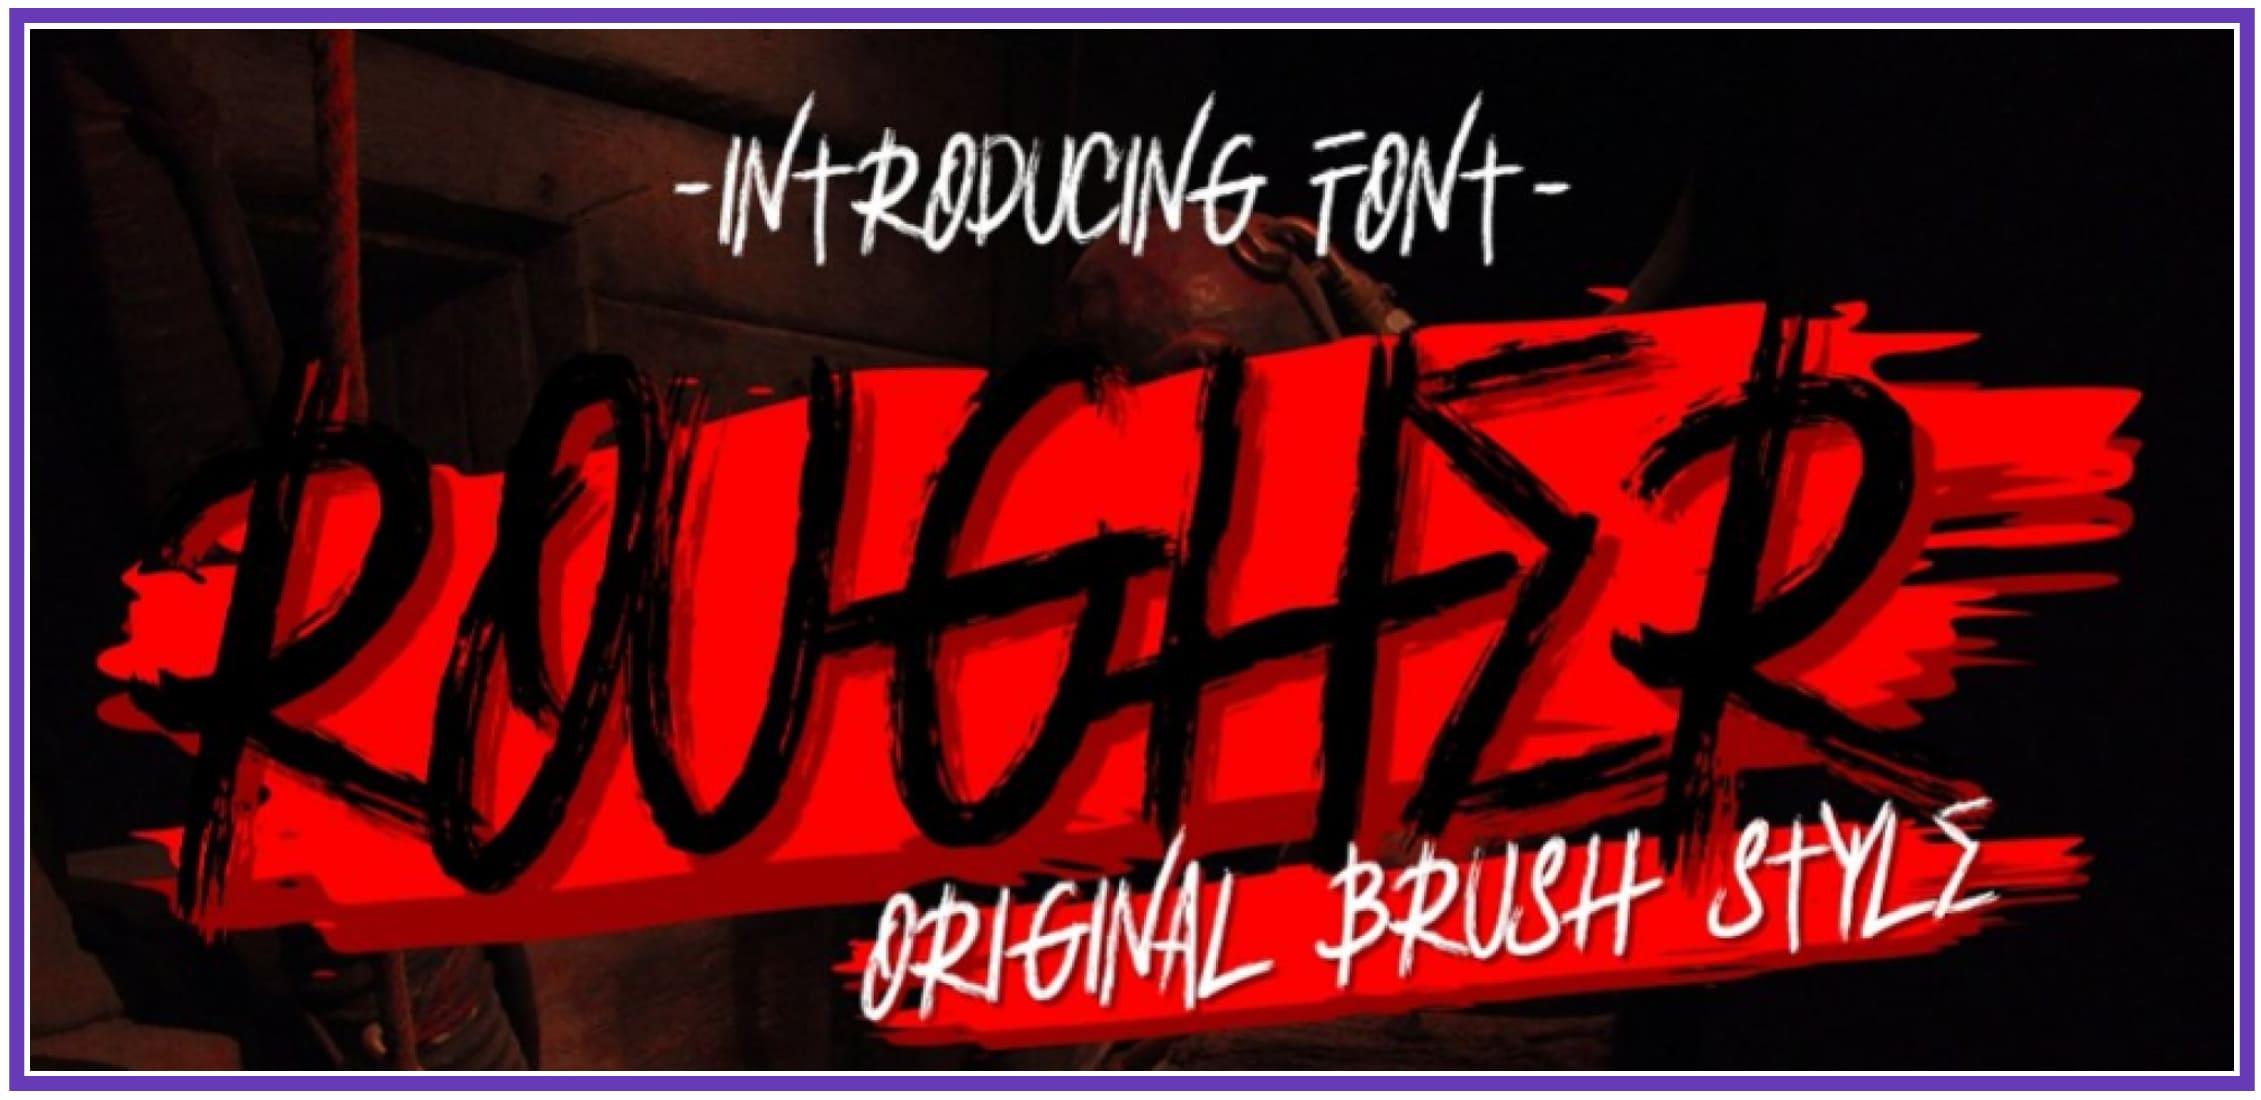 Premium Rougher. Punk Font.